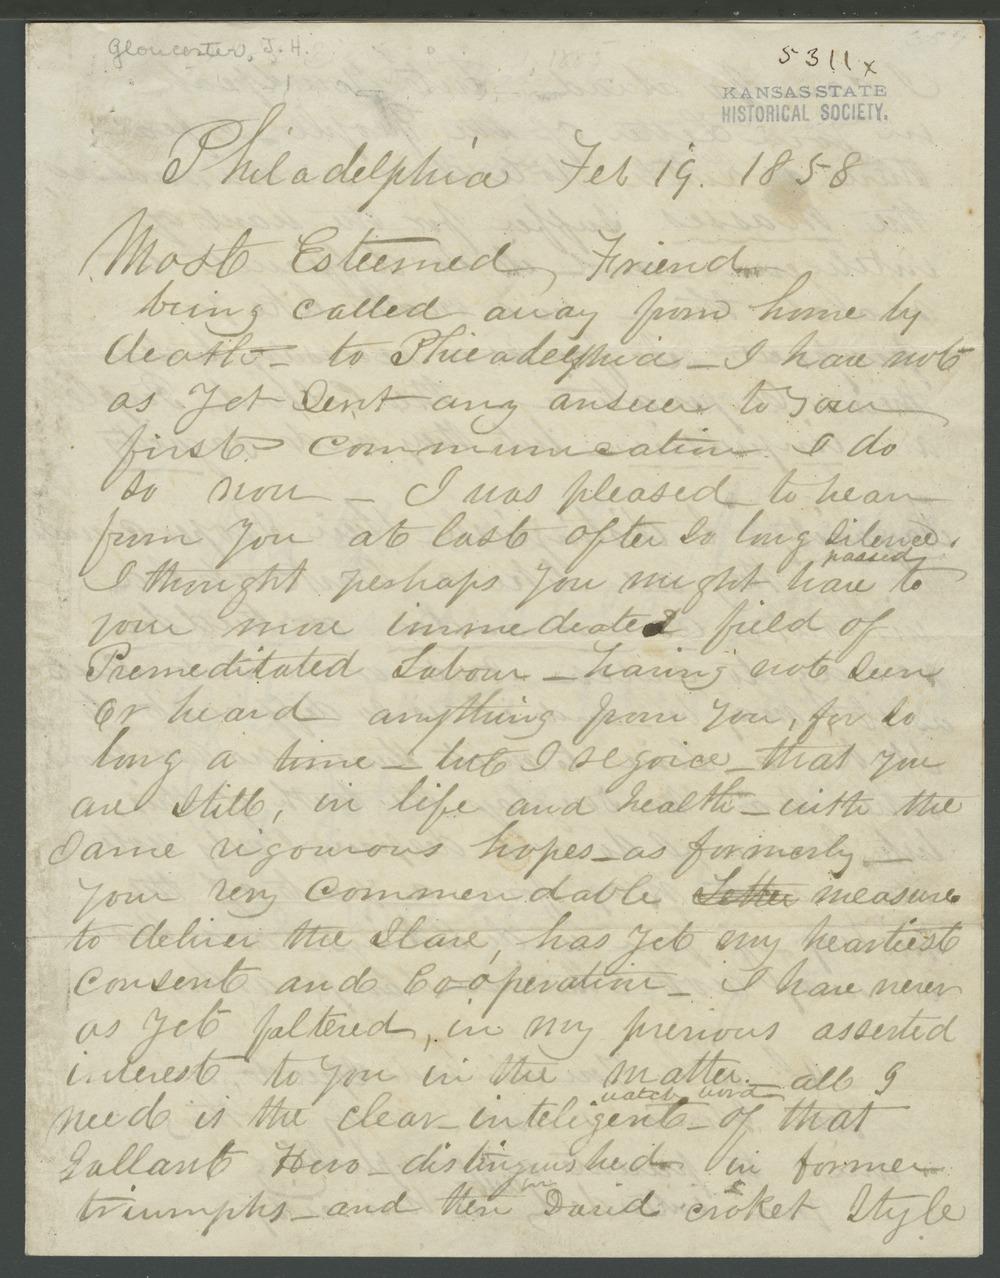 James N. Gloucester to John Brown - 1